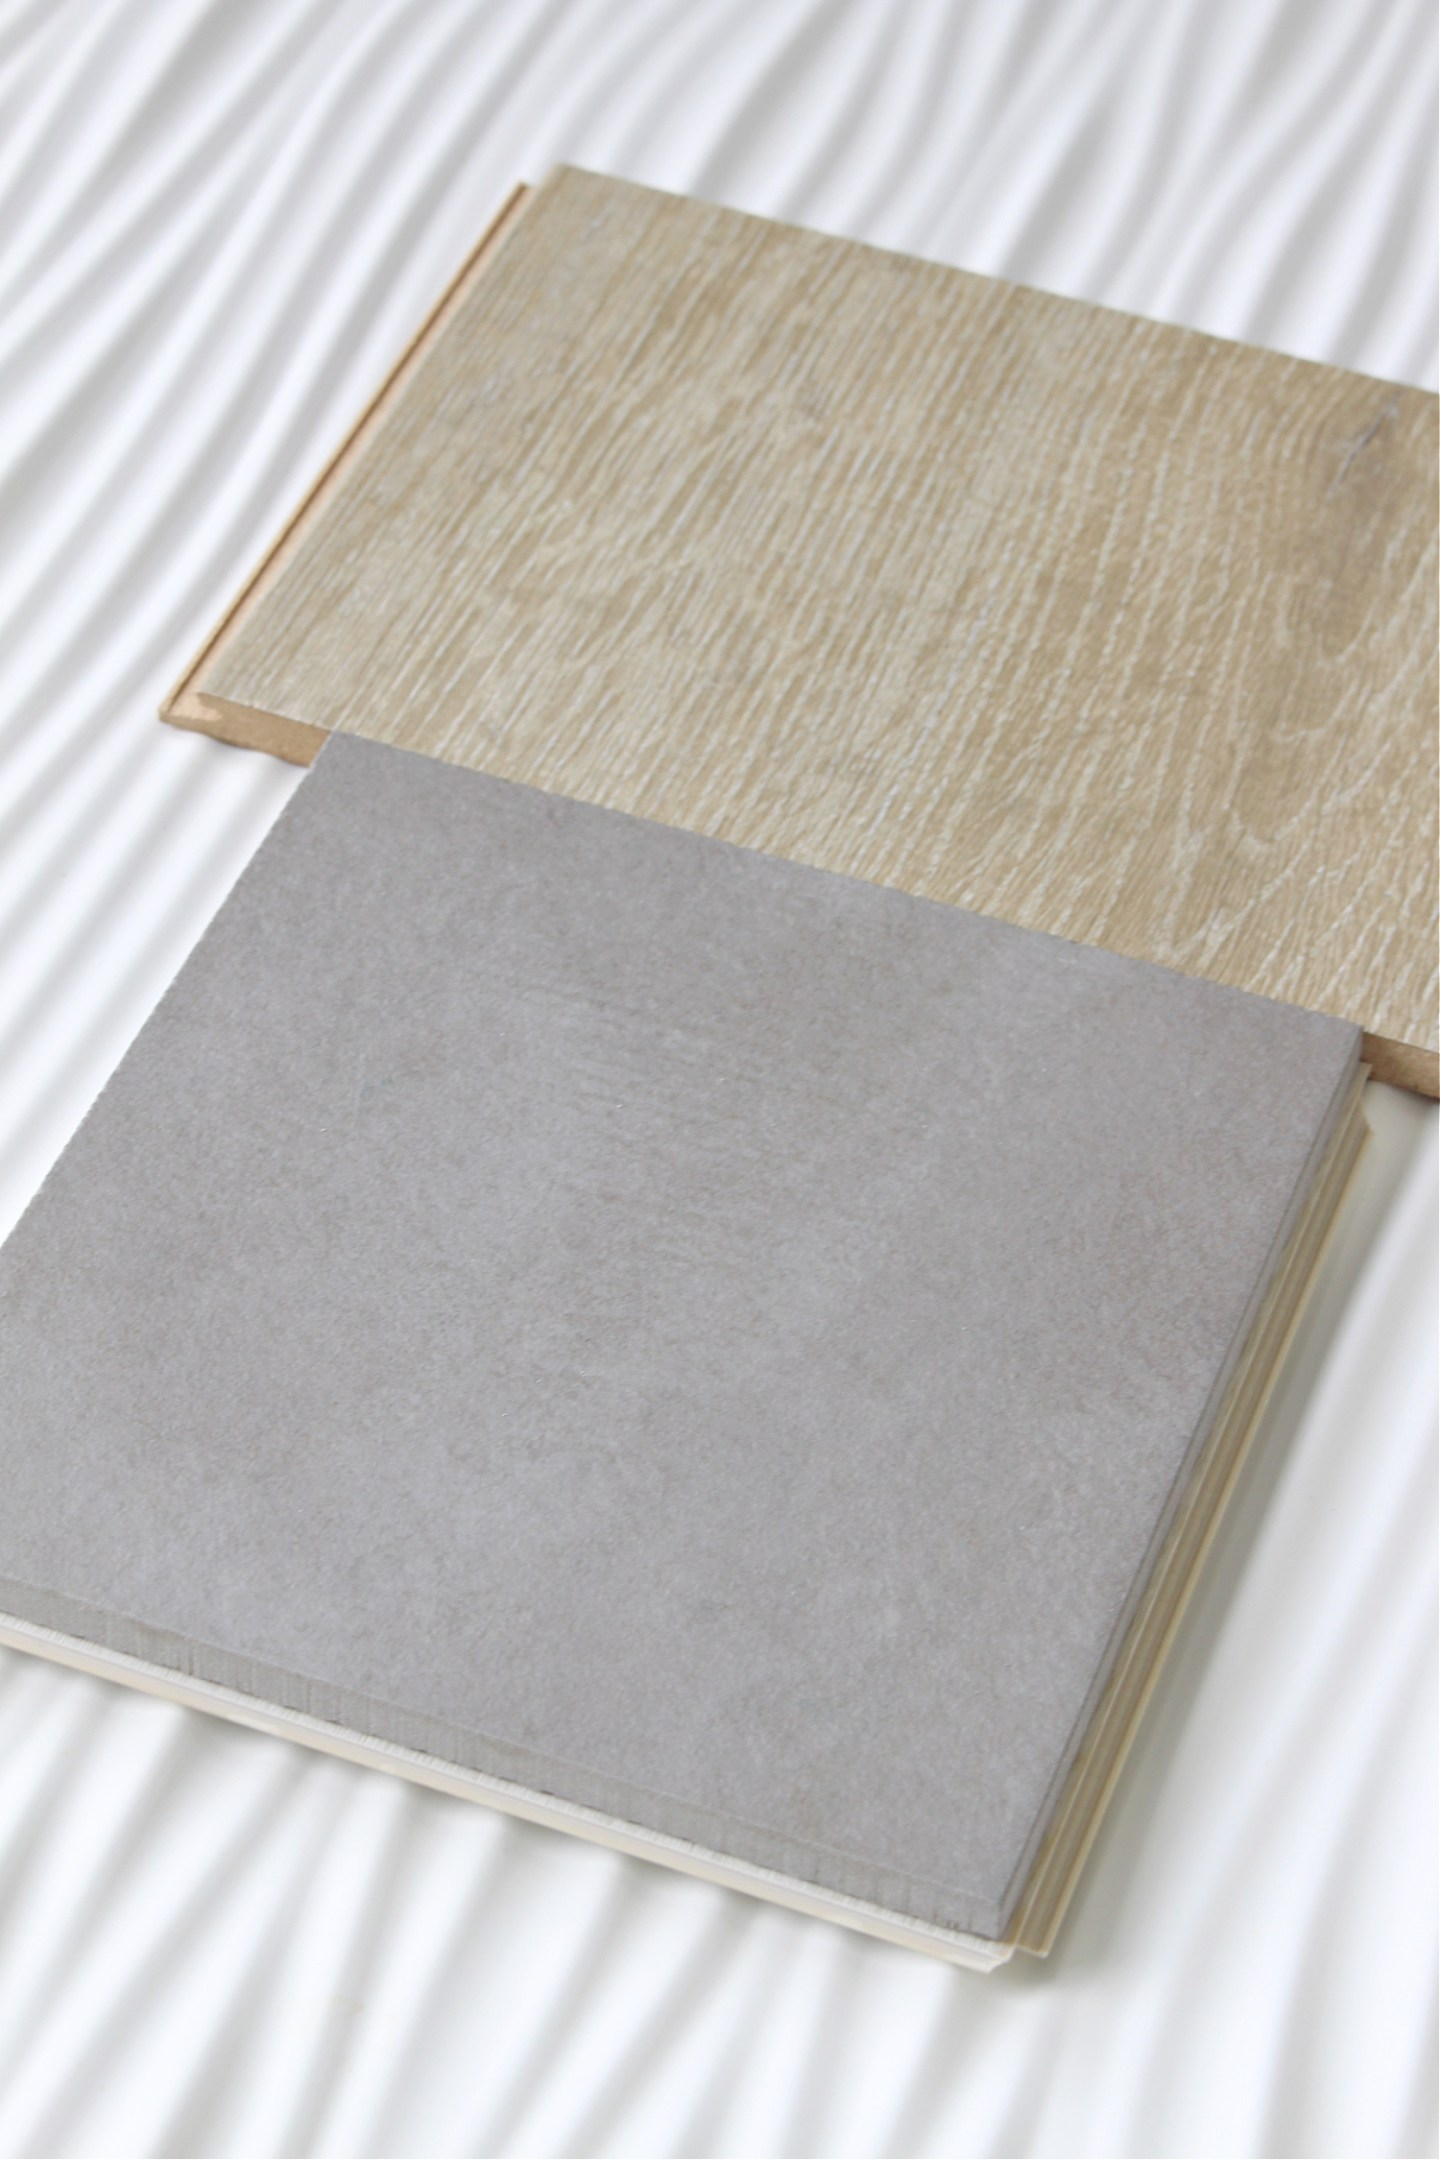 Tile That Looks Like Concrete Floor